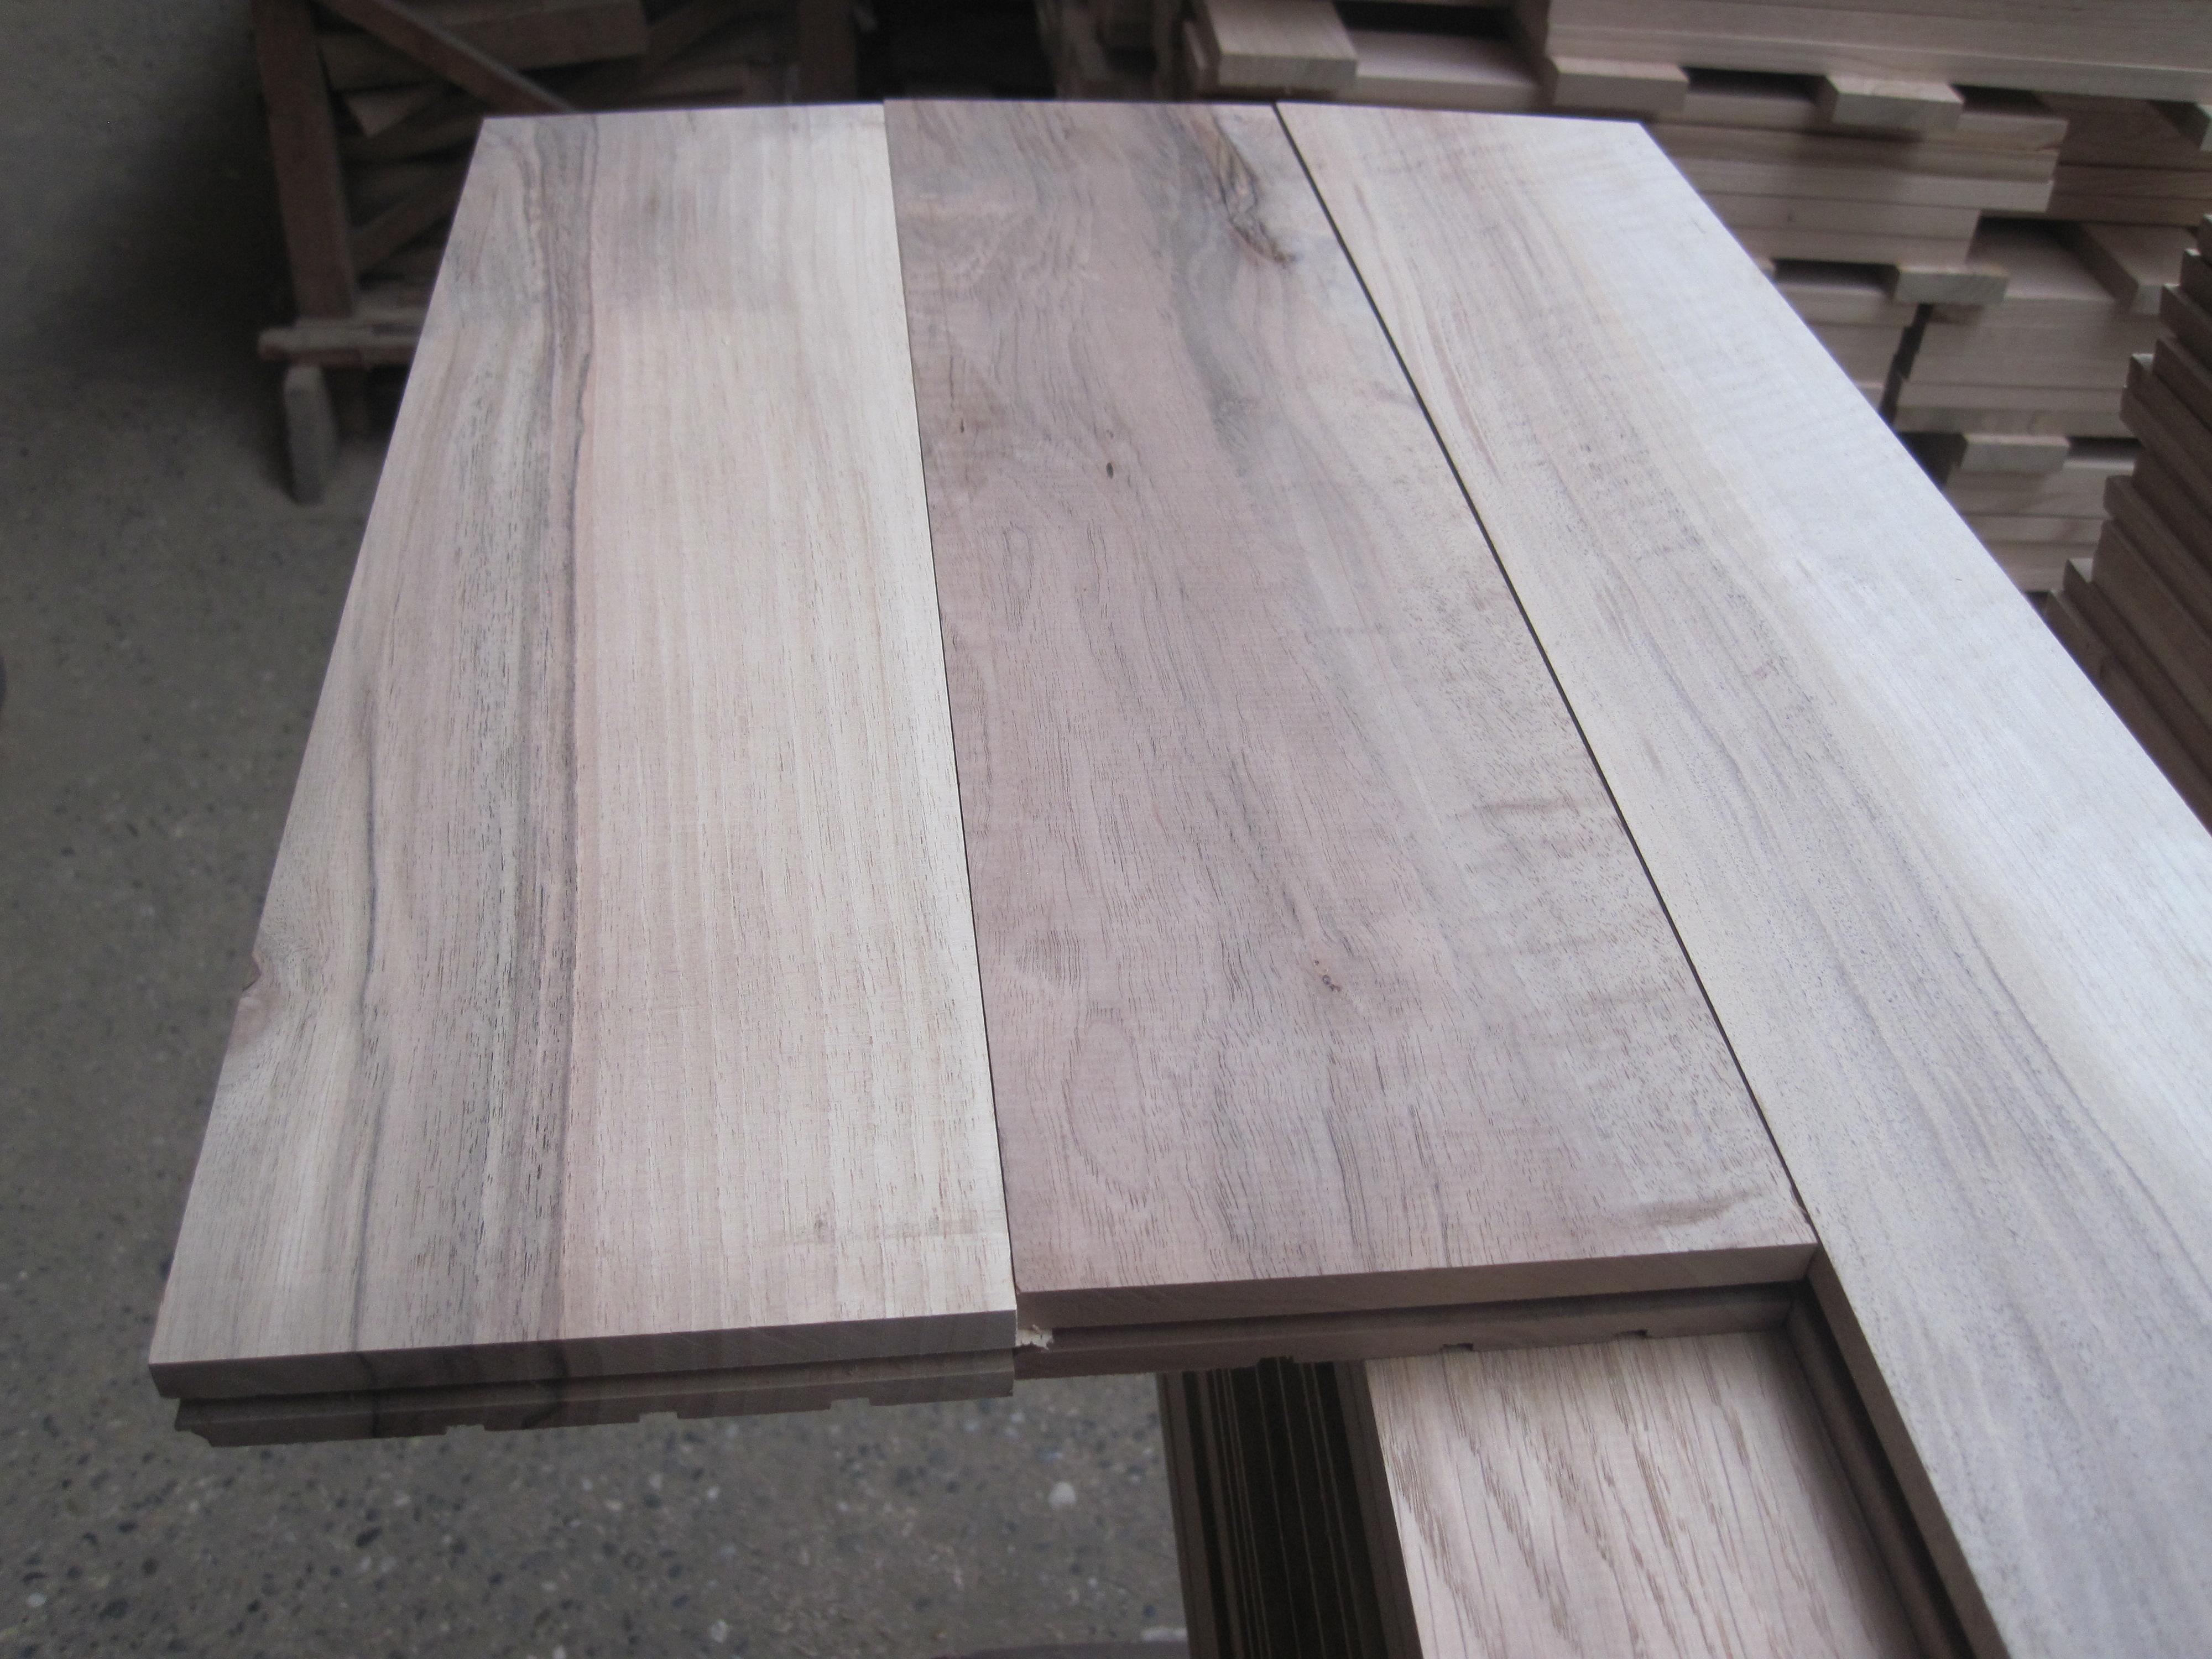 fabrication parquet noyer parquet noyer. Black Bedroom Furniture Sets. Home Design Ideas